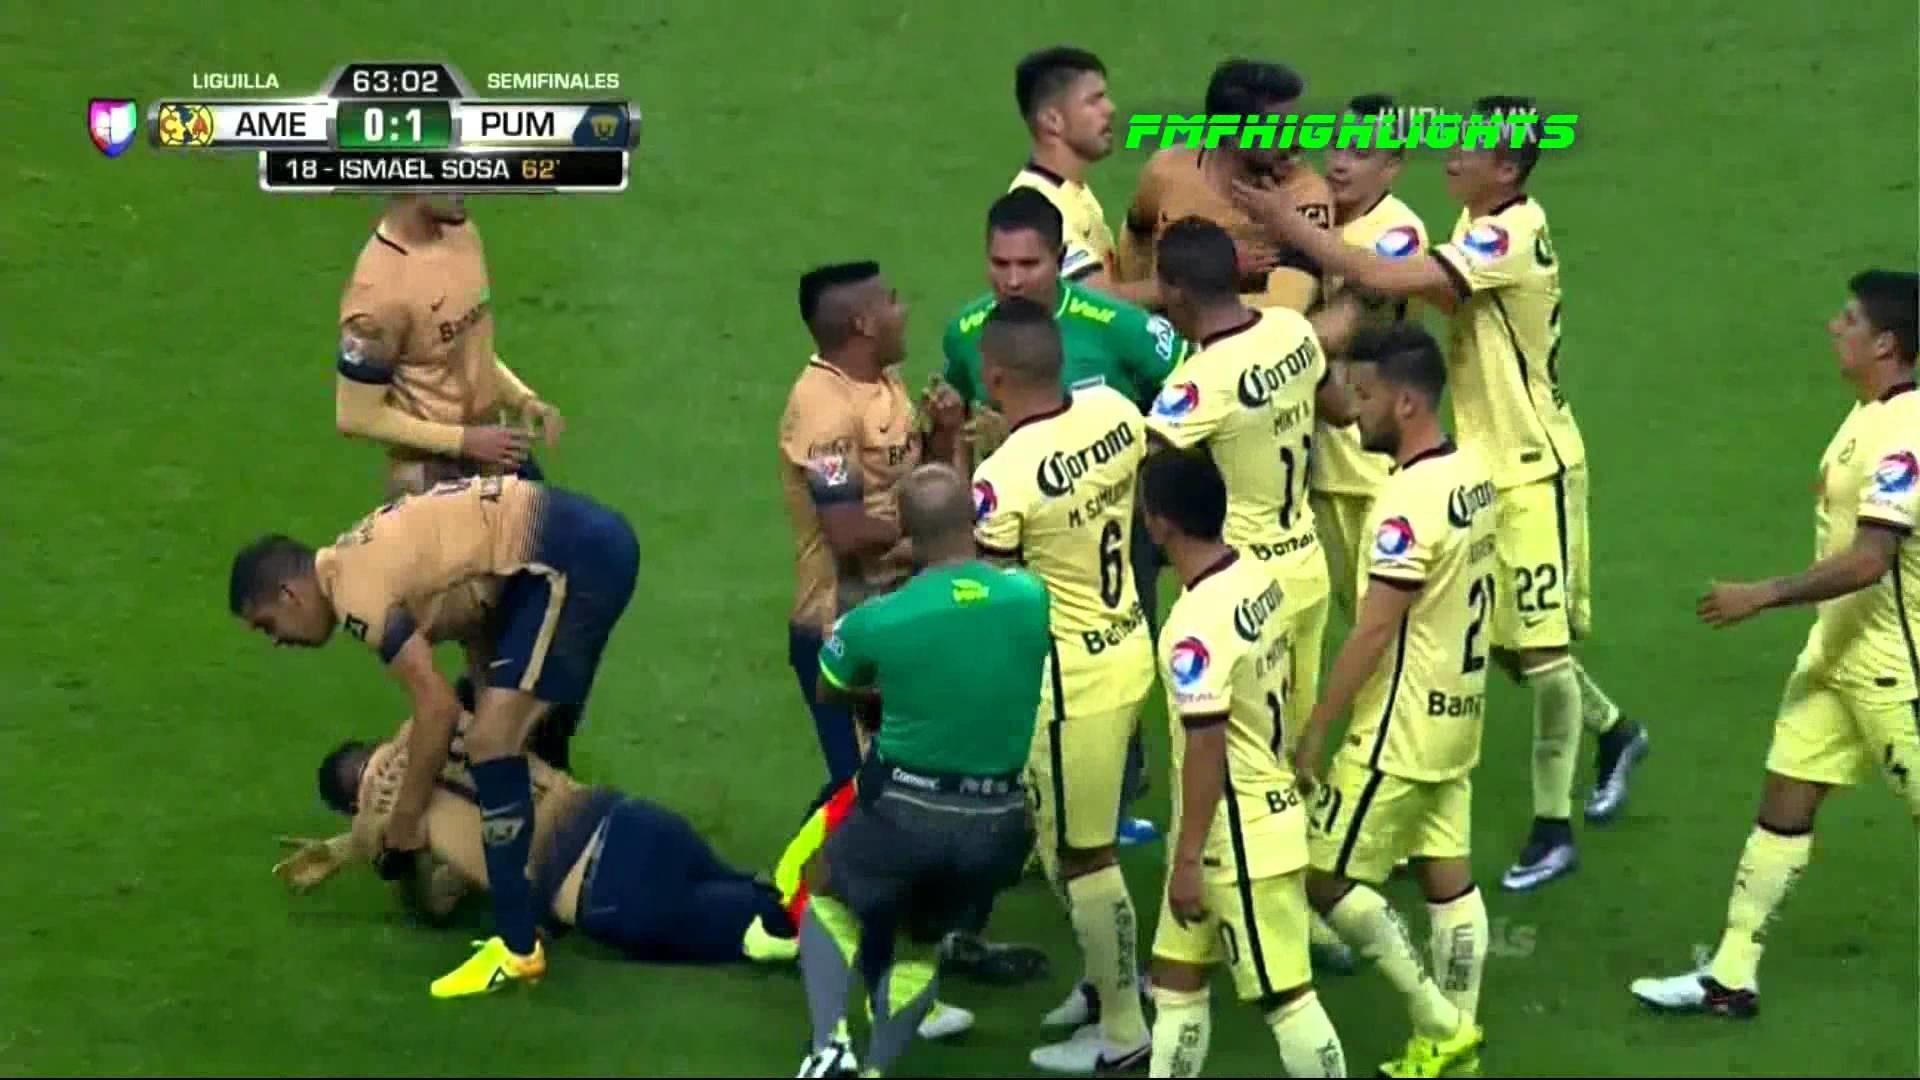 Club America VS Pumas 0-3 Dec 3, 2015 Full Highlights HD 60FPS – YouTube